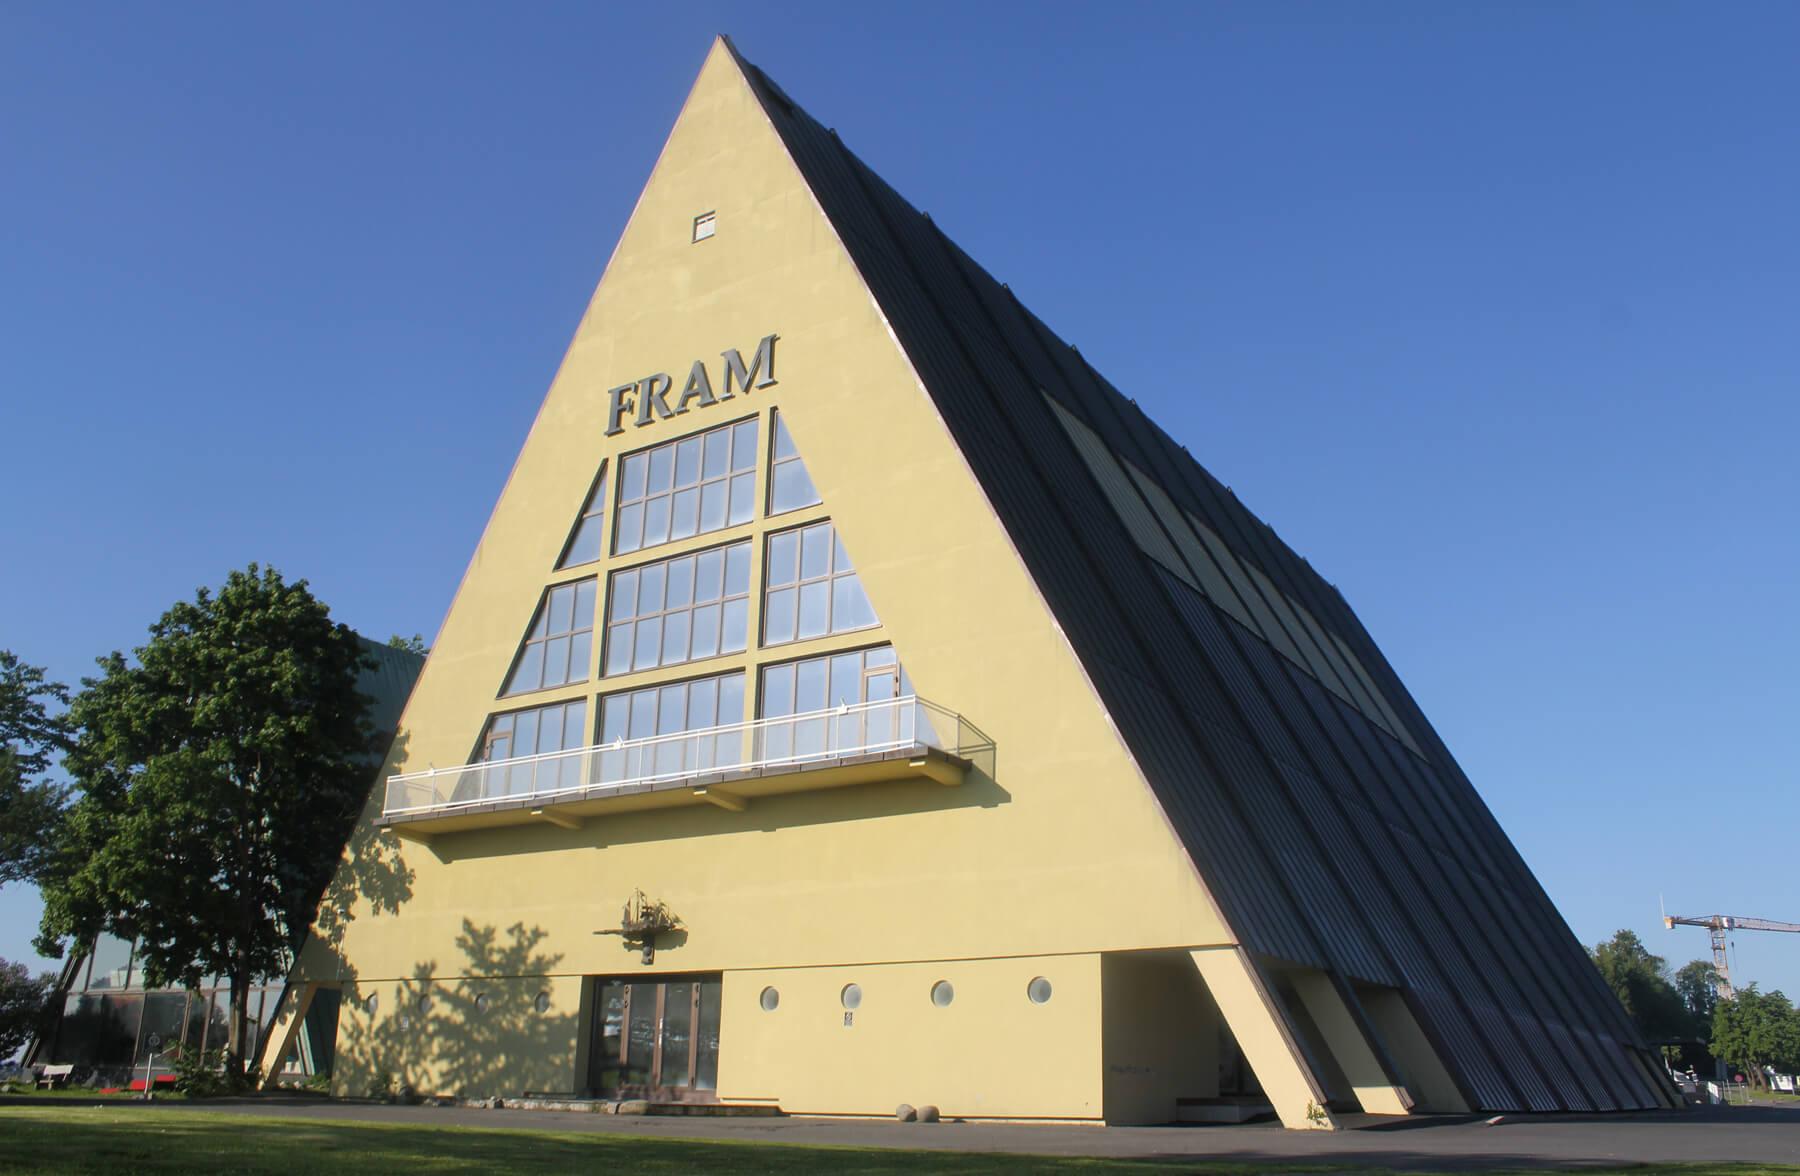 Музей Фрама в Осло